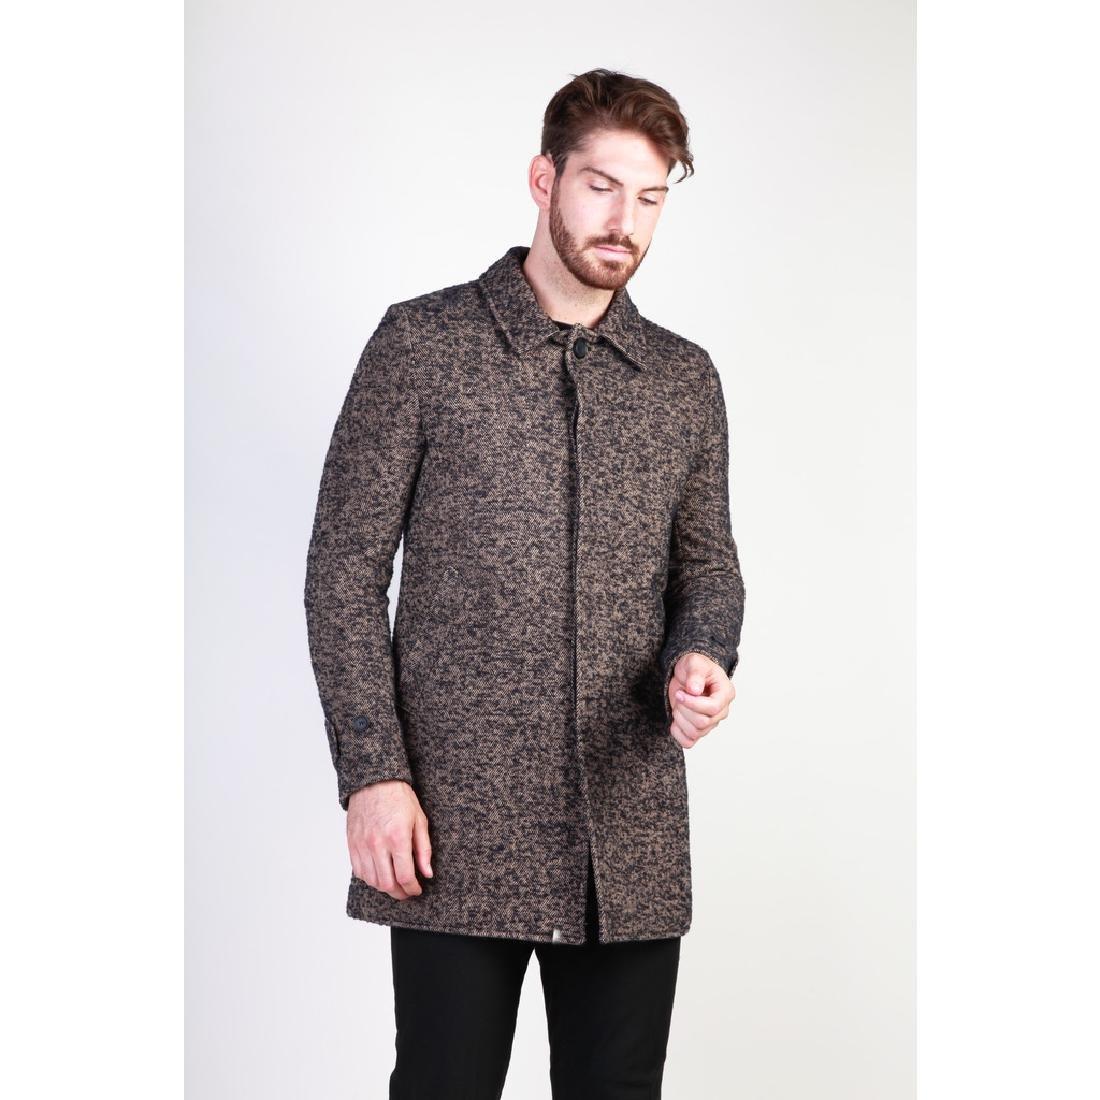 New Men's Italian Wool Blend Coat US 38 - 2